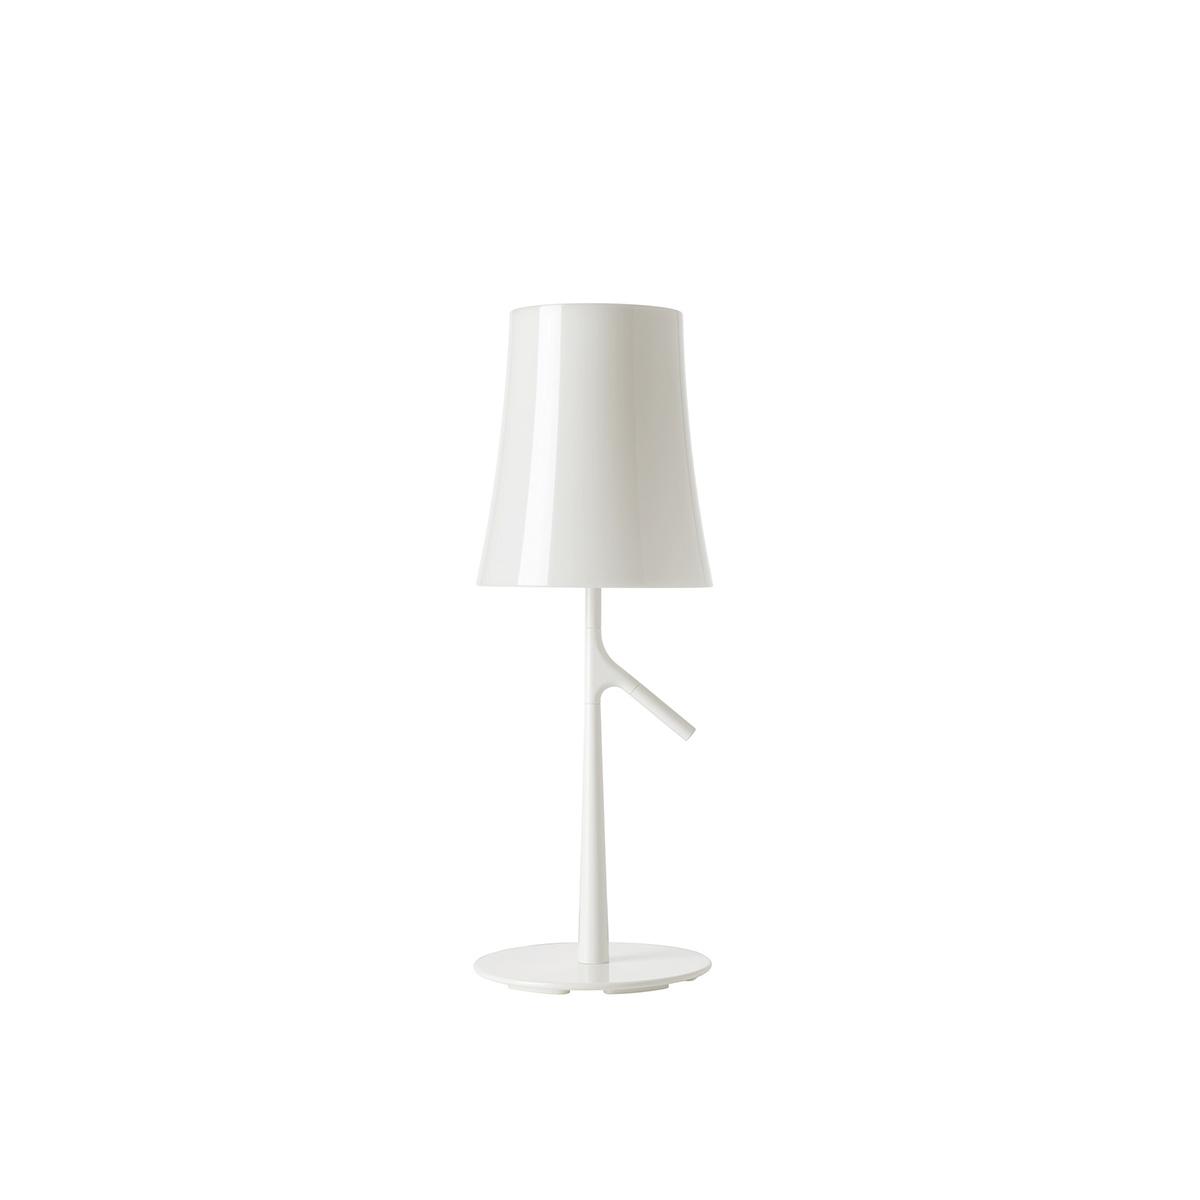 Stona lampa Birdie piccola 2210012 10